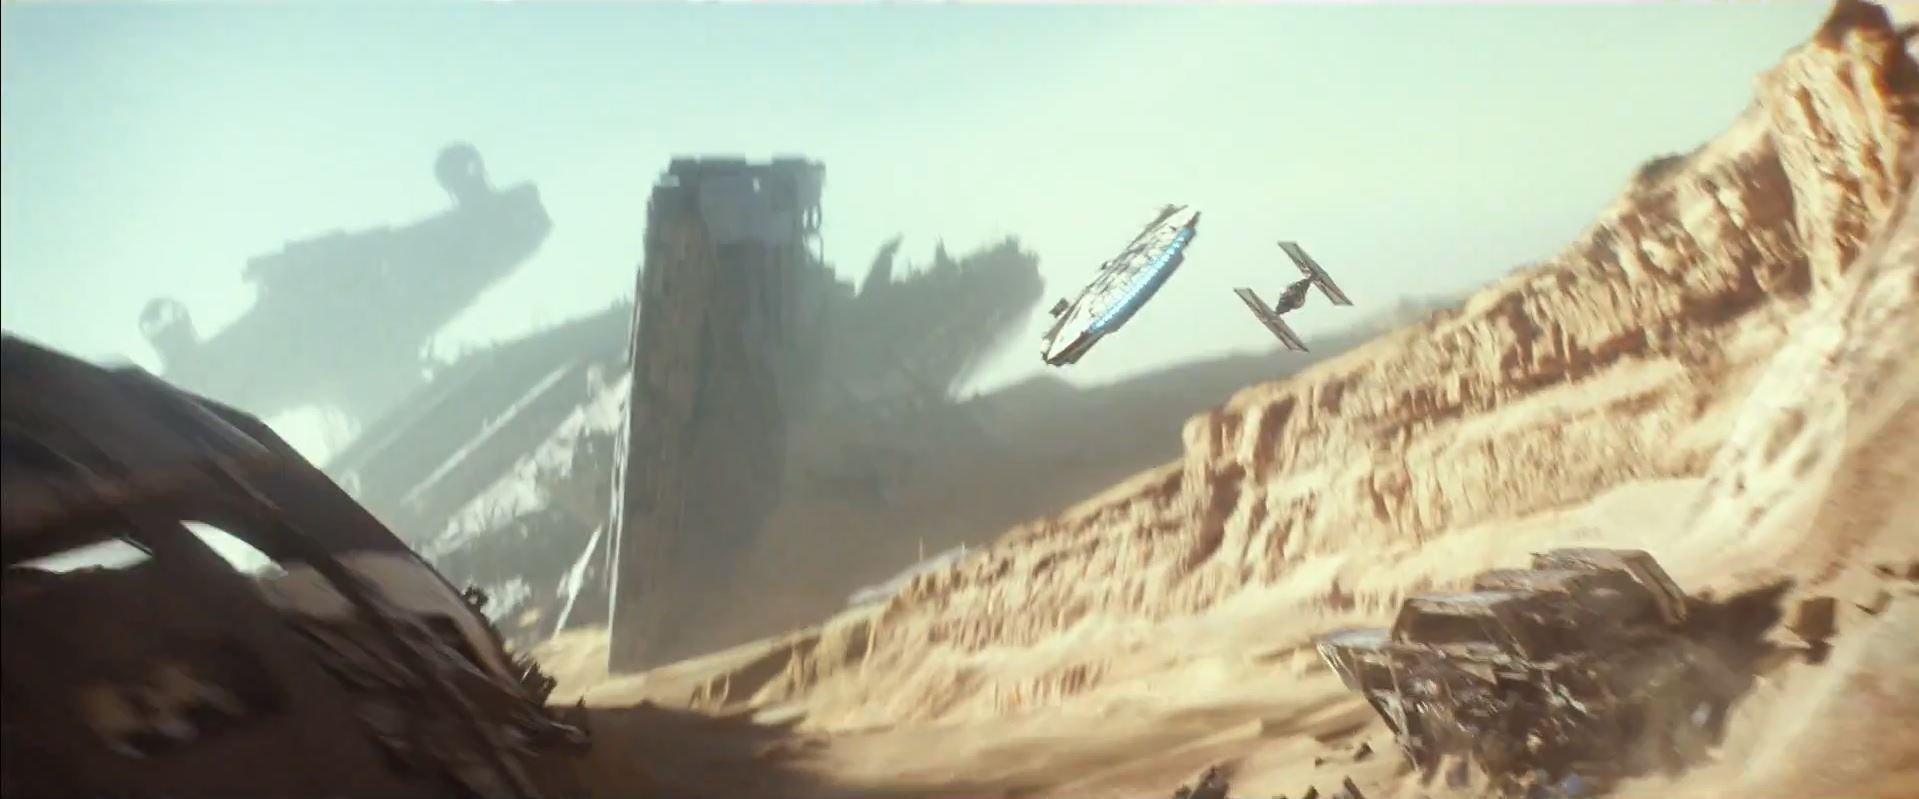 Millennium Falcon being chased on Jakku